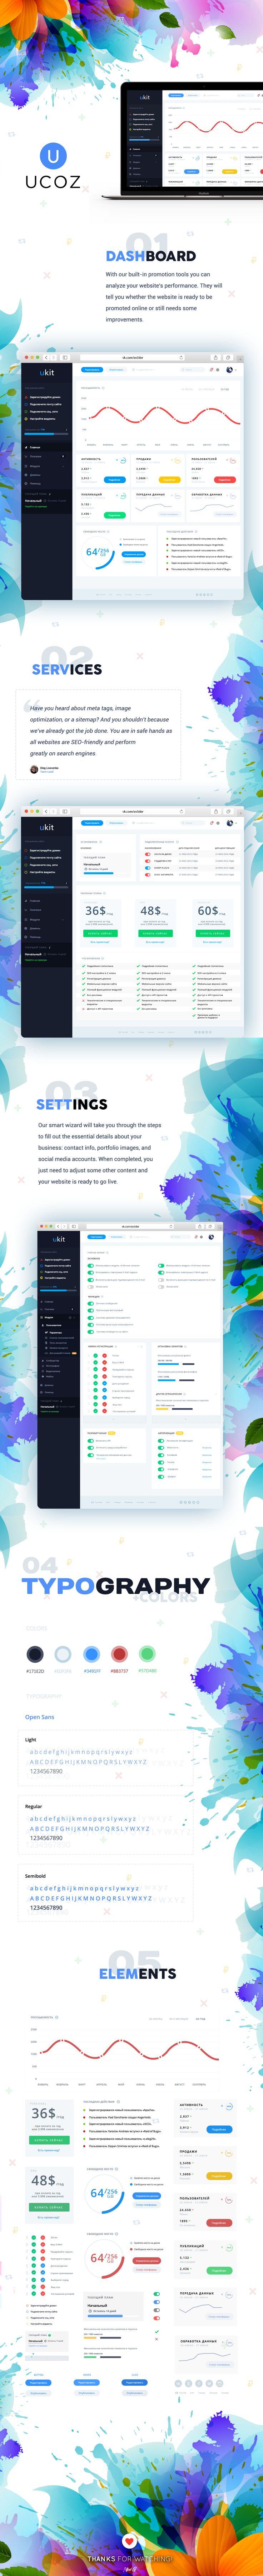 uKit – Dashboard UI/UX Kit